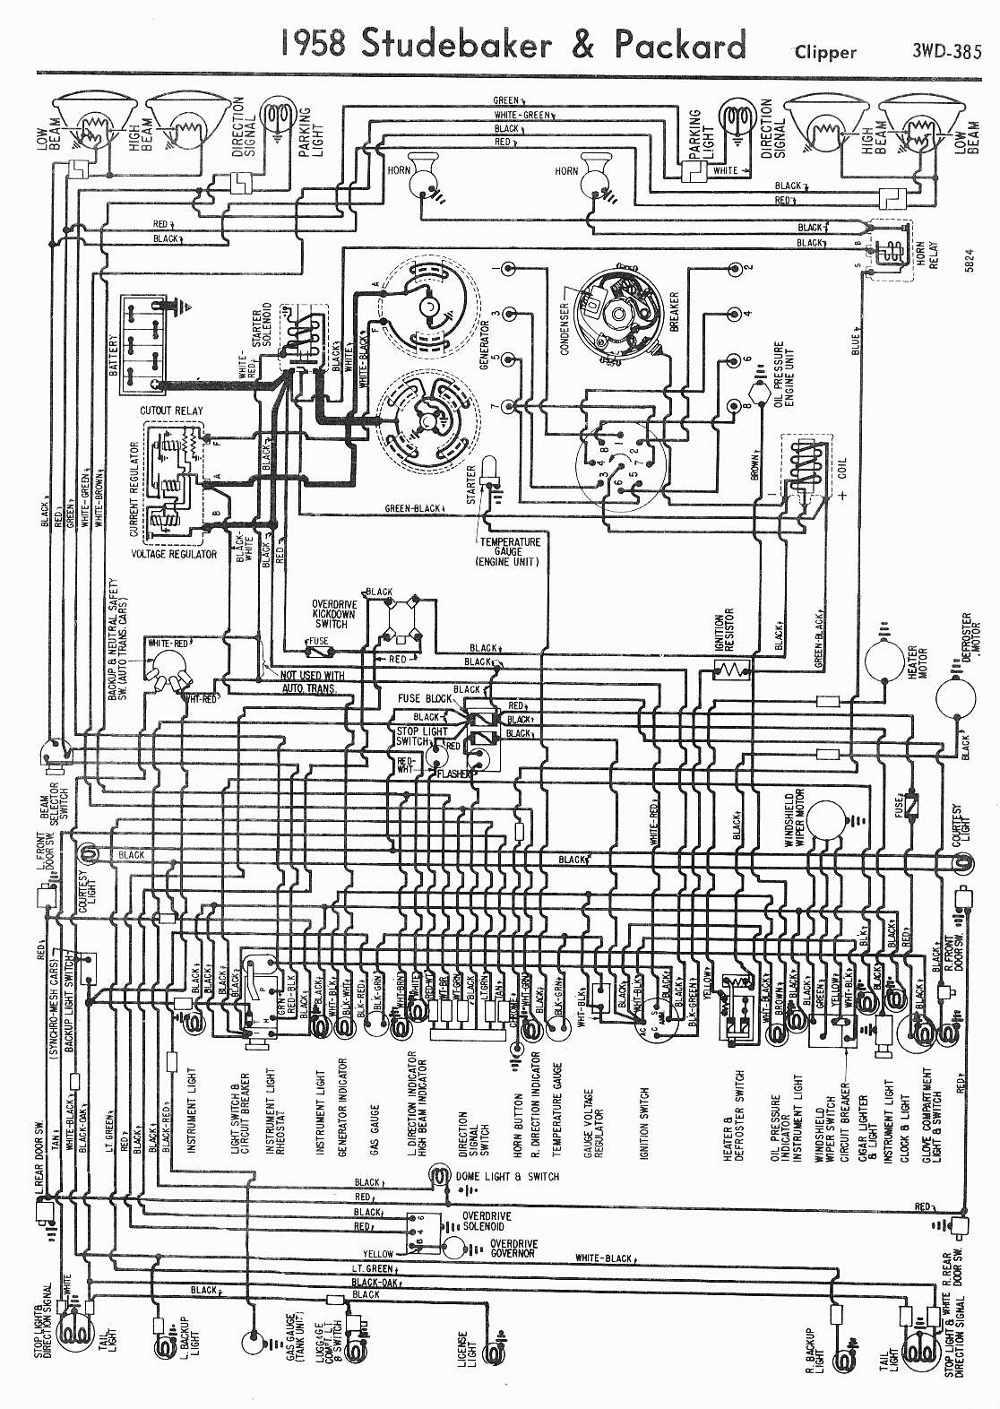 packard car manuals wiring diagrams pdf fault codes rh automotive manuals net Computer Wiring Diagram 1986 Dodge Truck Wiring Diagram